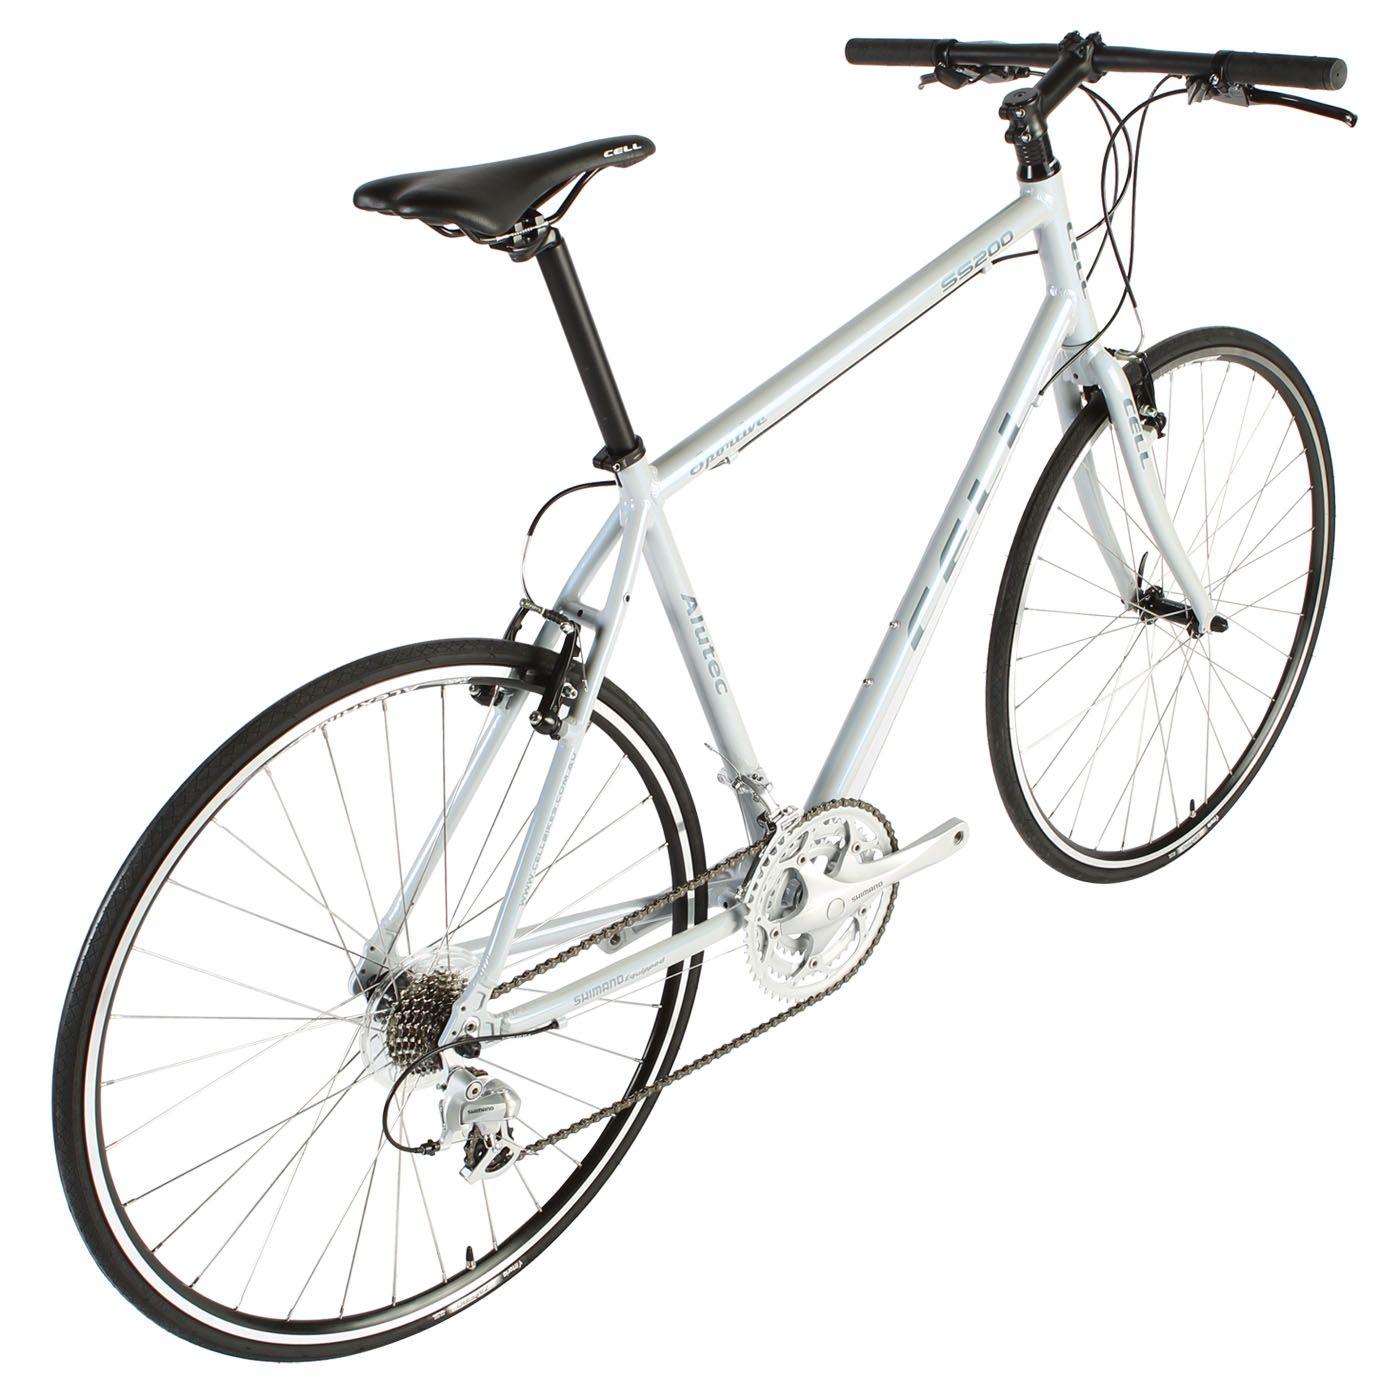 Best Fitness Bike Under 500 Dollars 399 With Images Biking